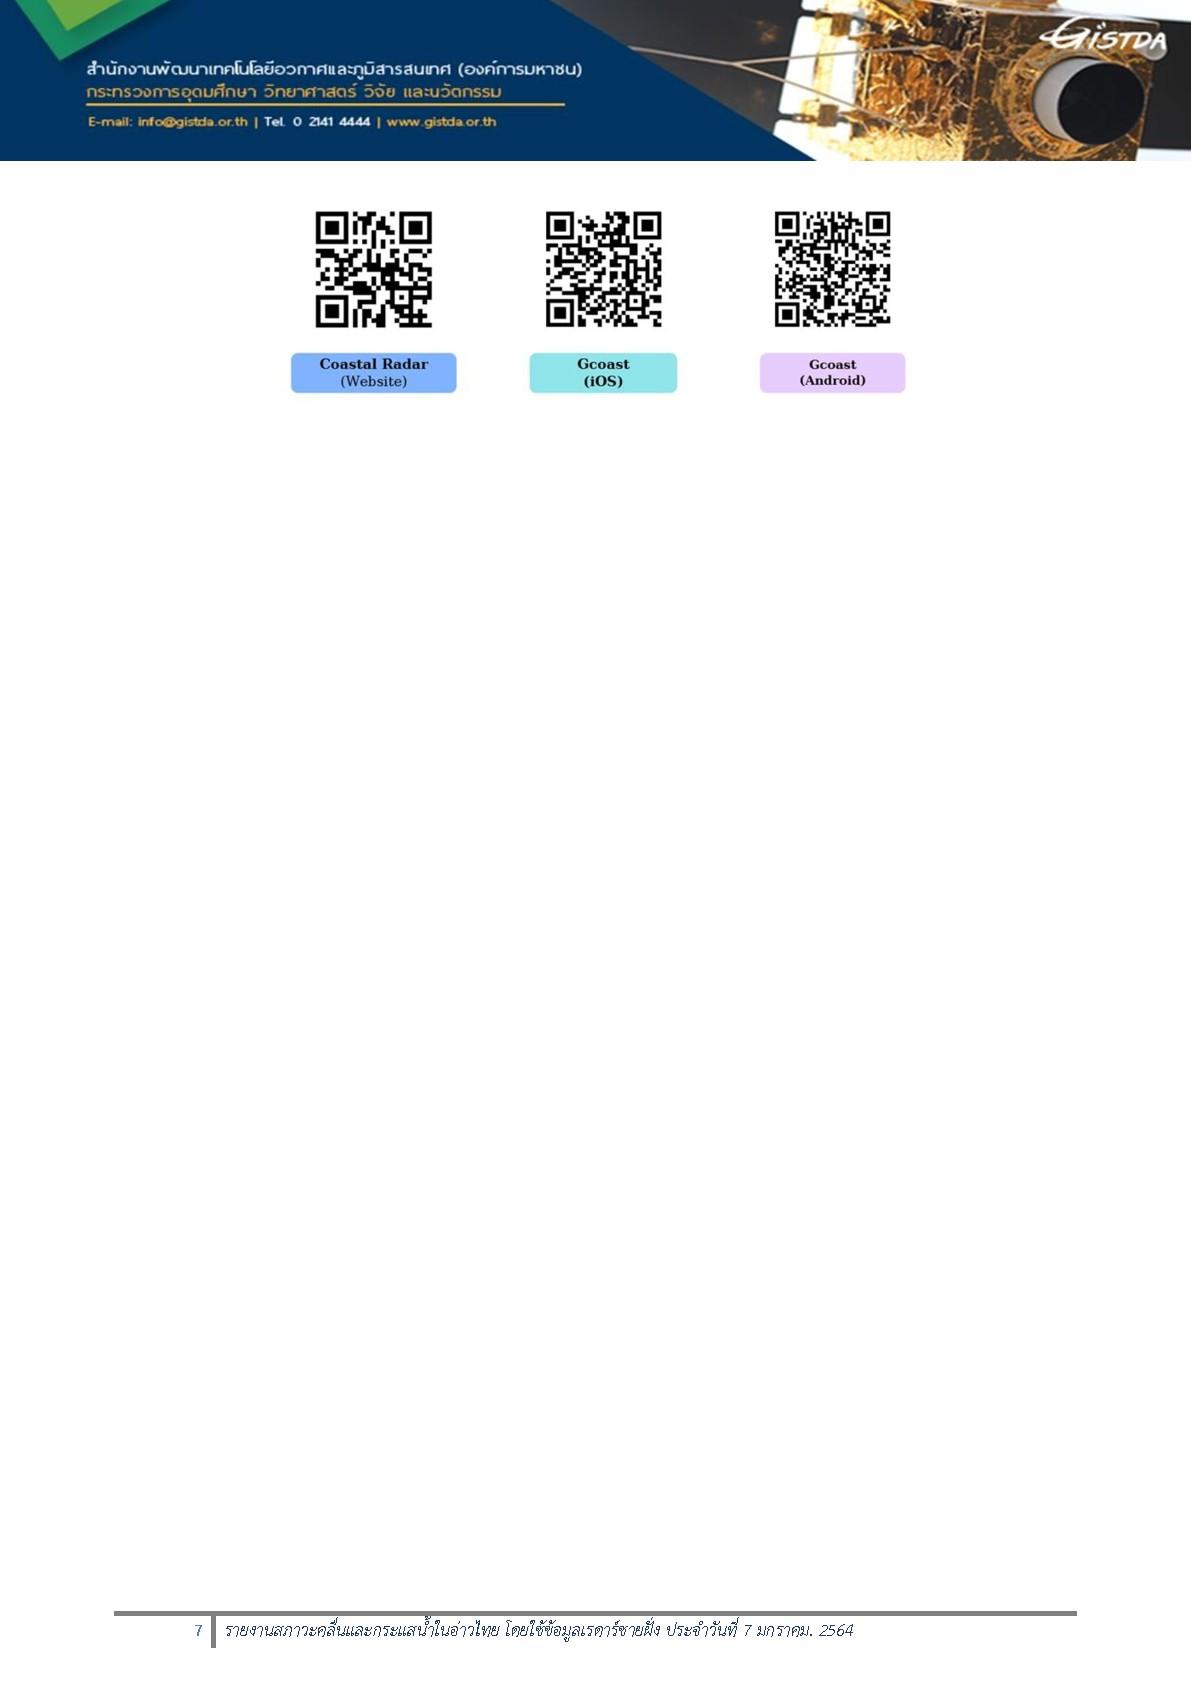 20210107-007-007